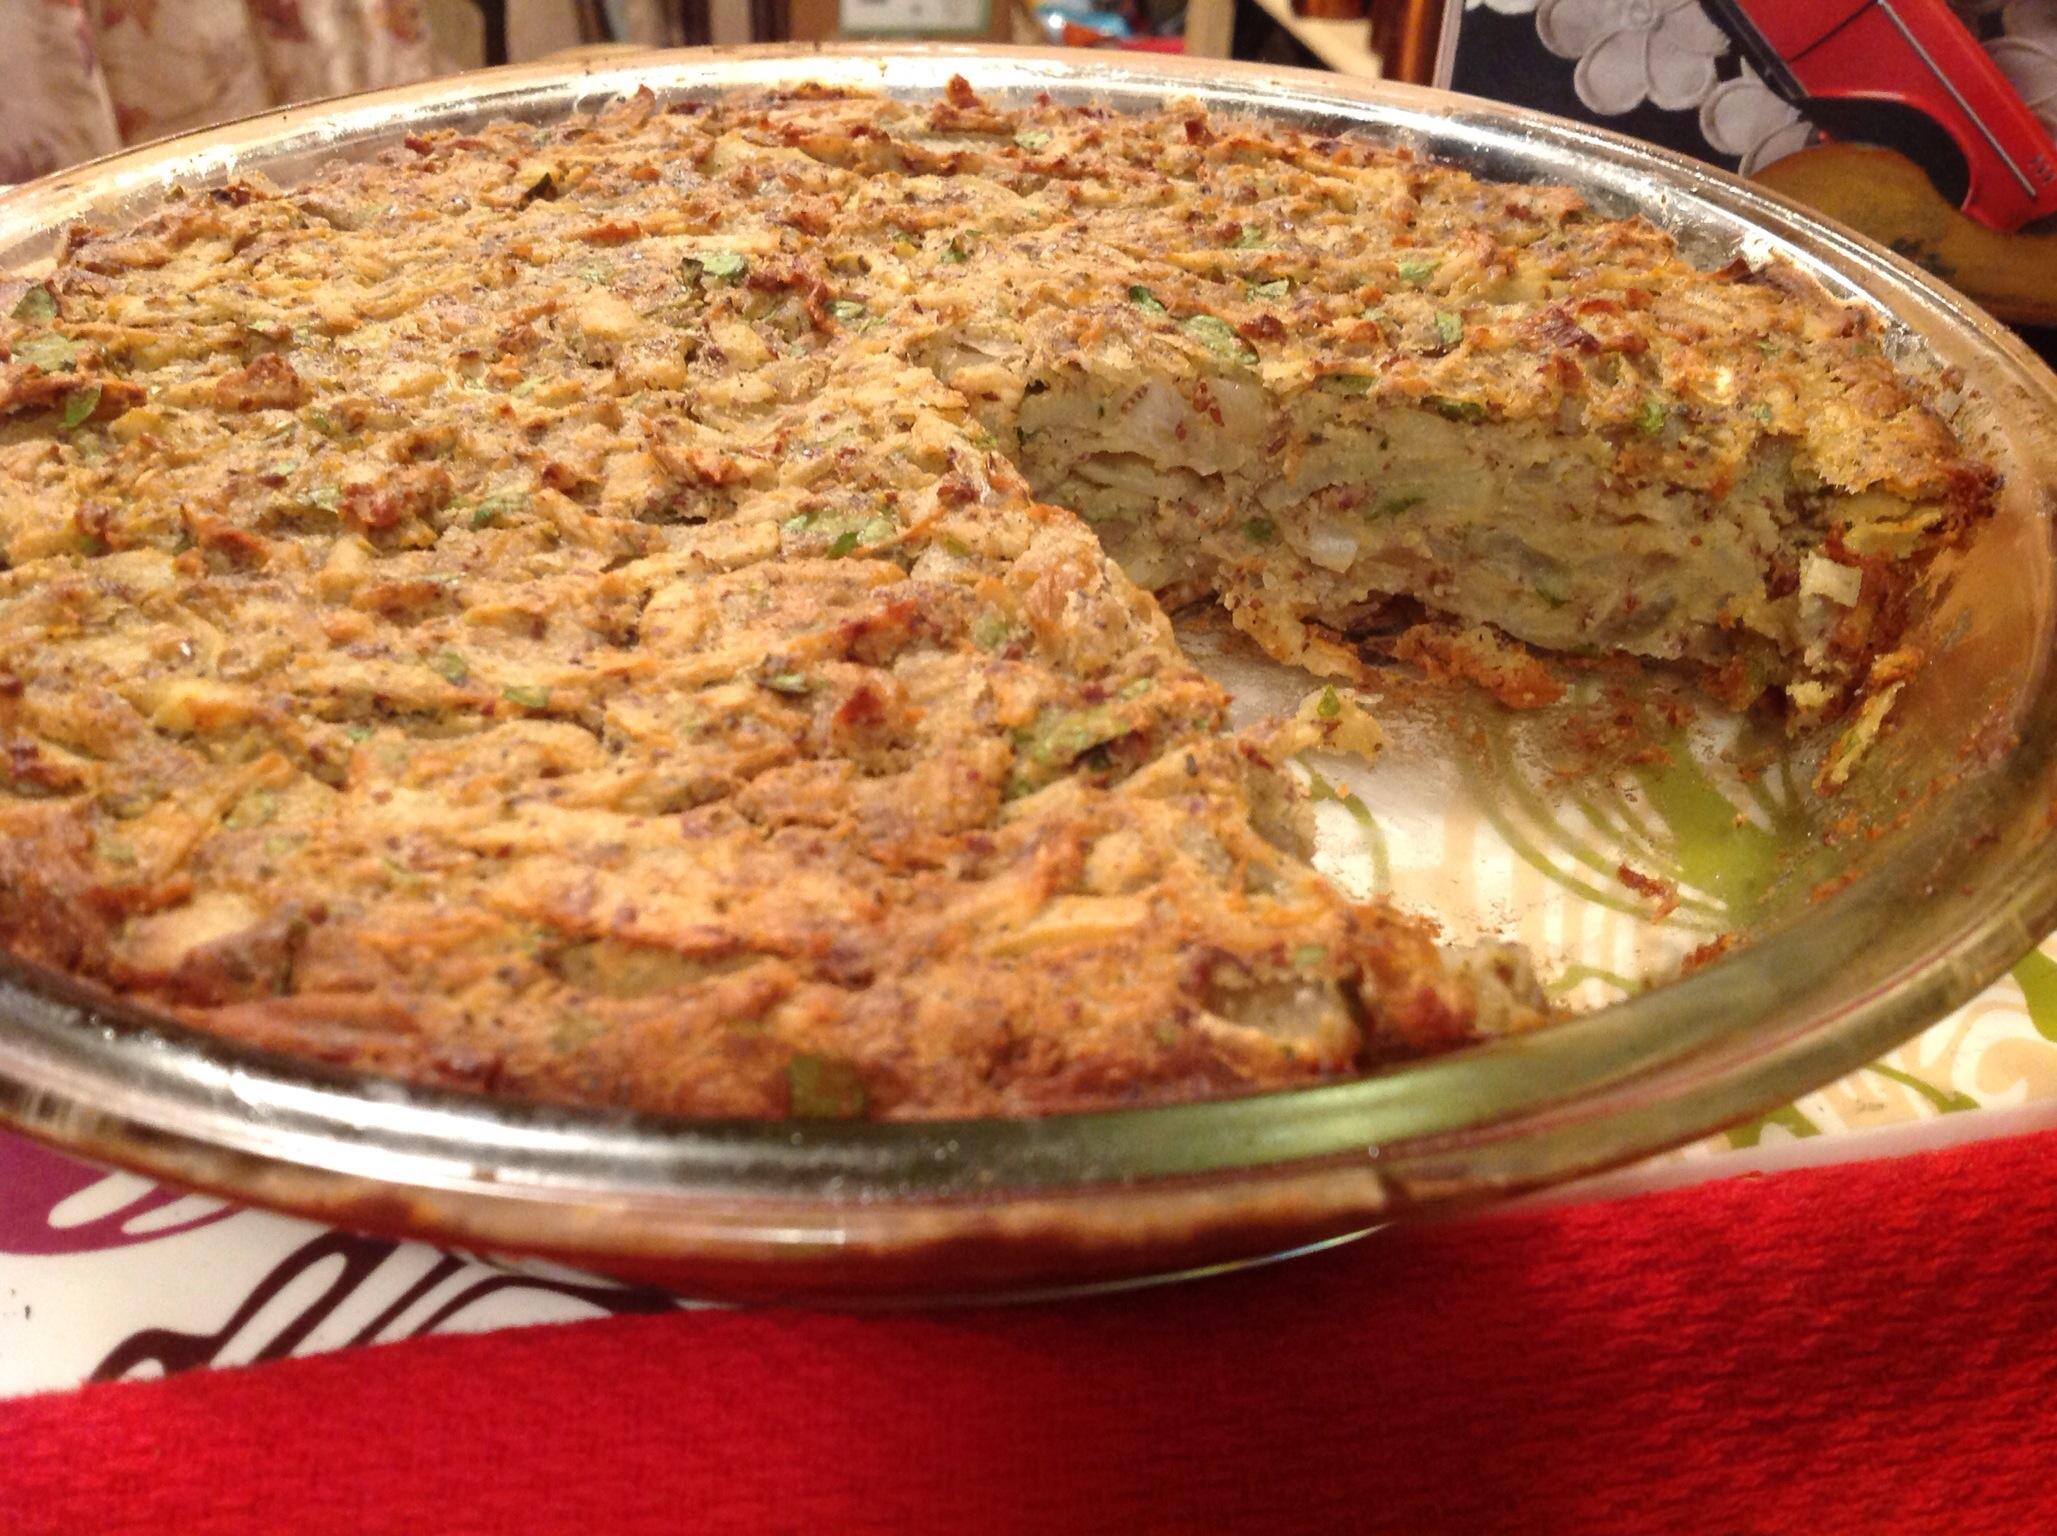 ... with sauteed shallots recipes dishmaps potato kugel with sauteed